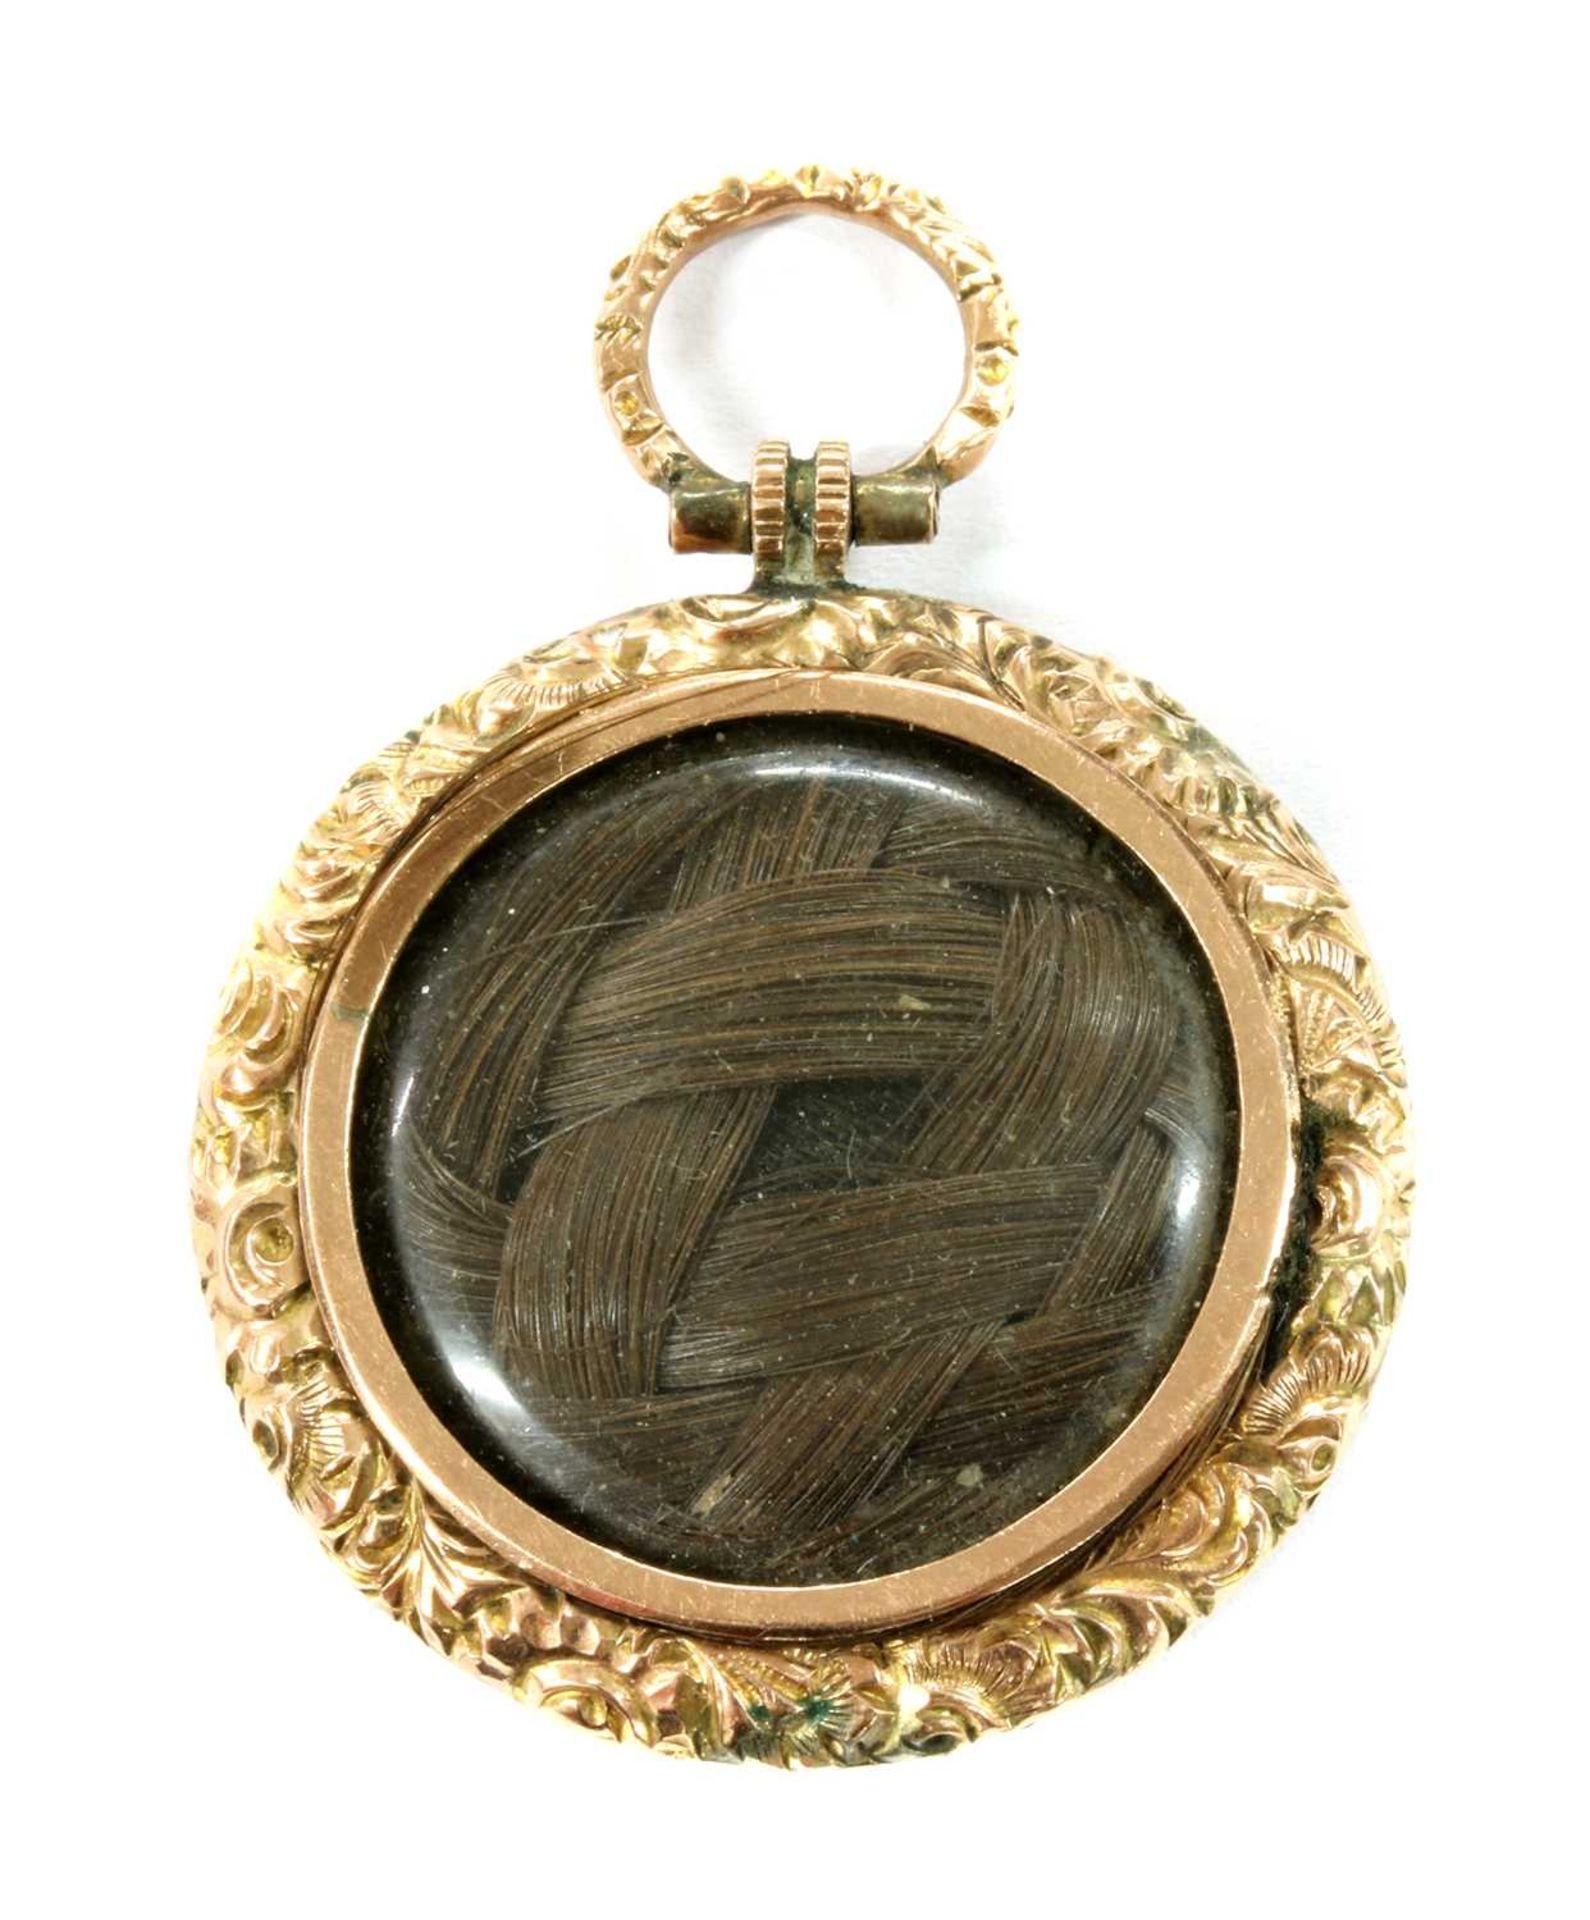 A Victorian gold mounted shakudo memorial locket, - Image 2 of 2